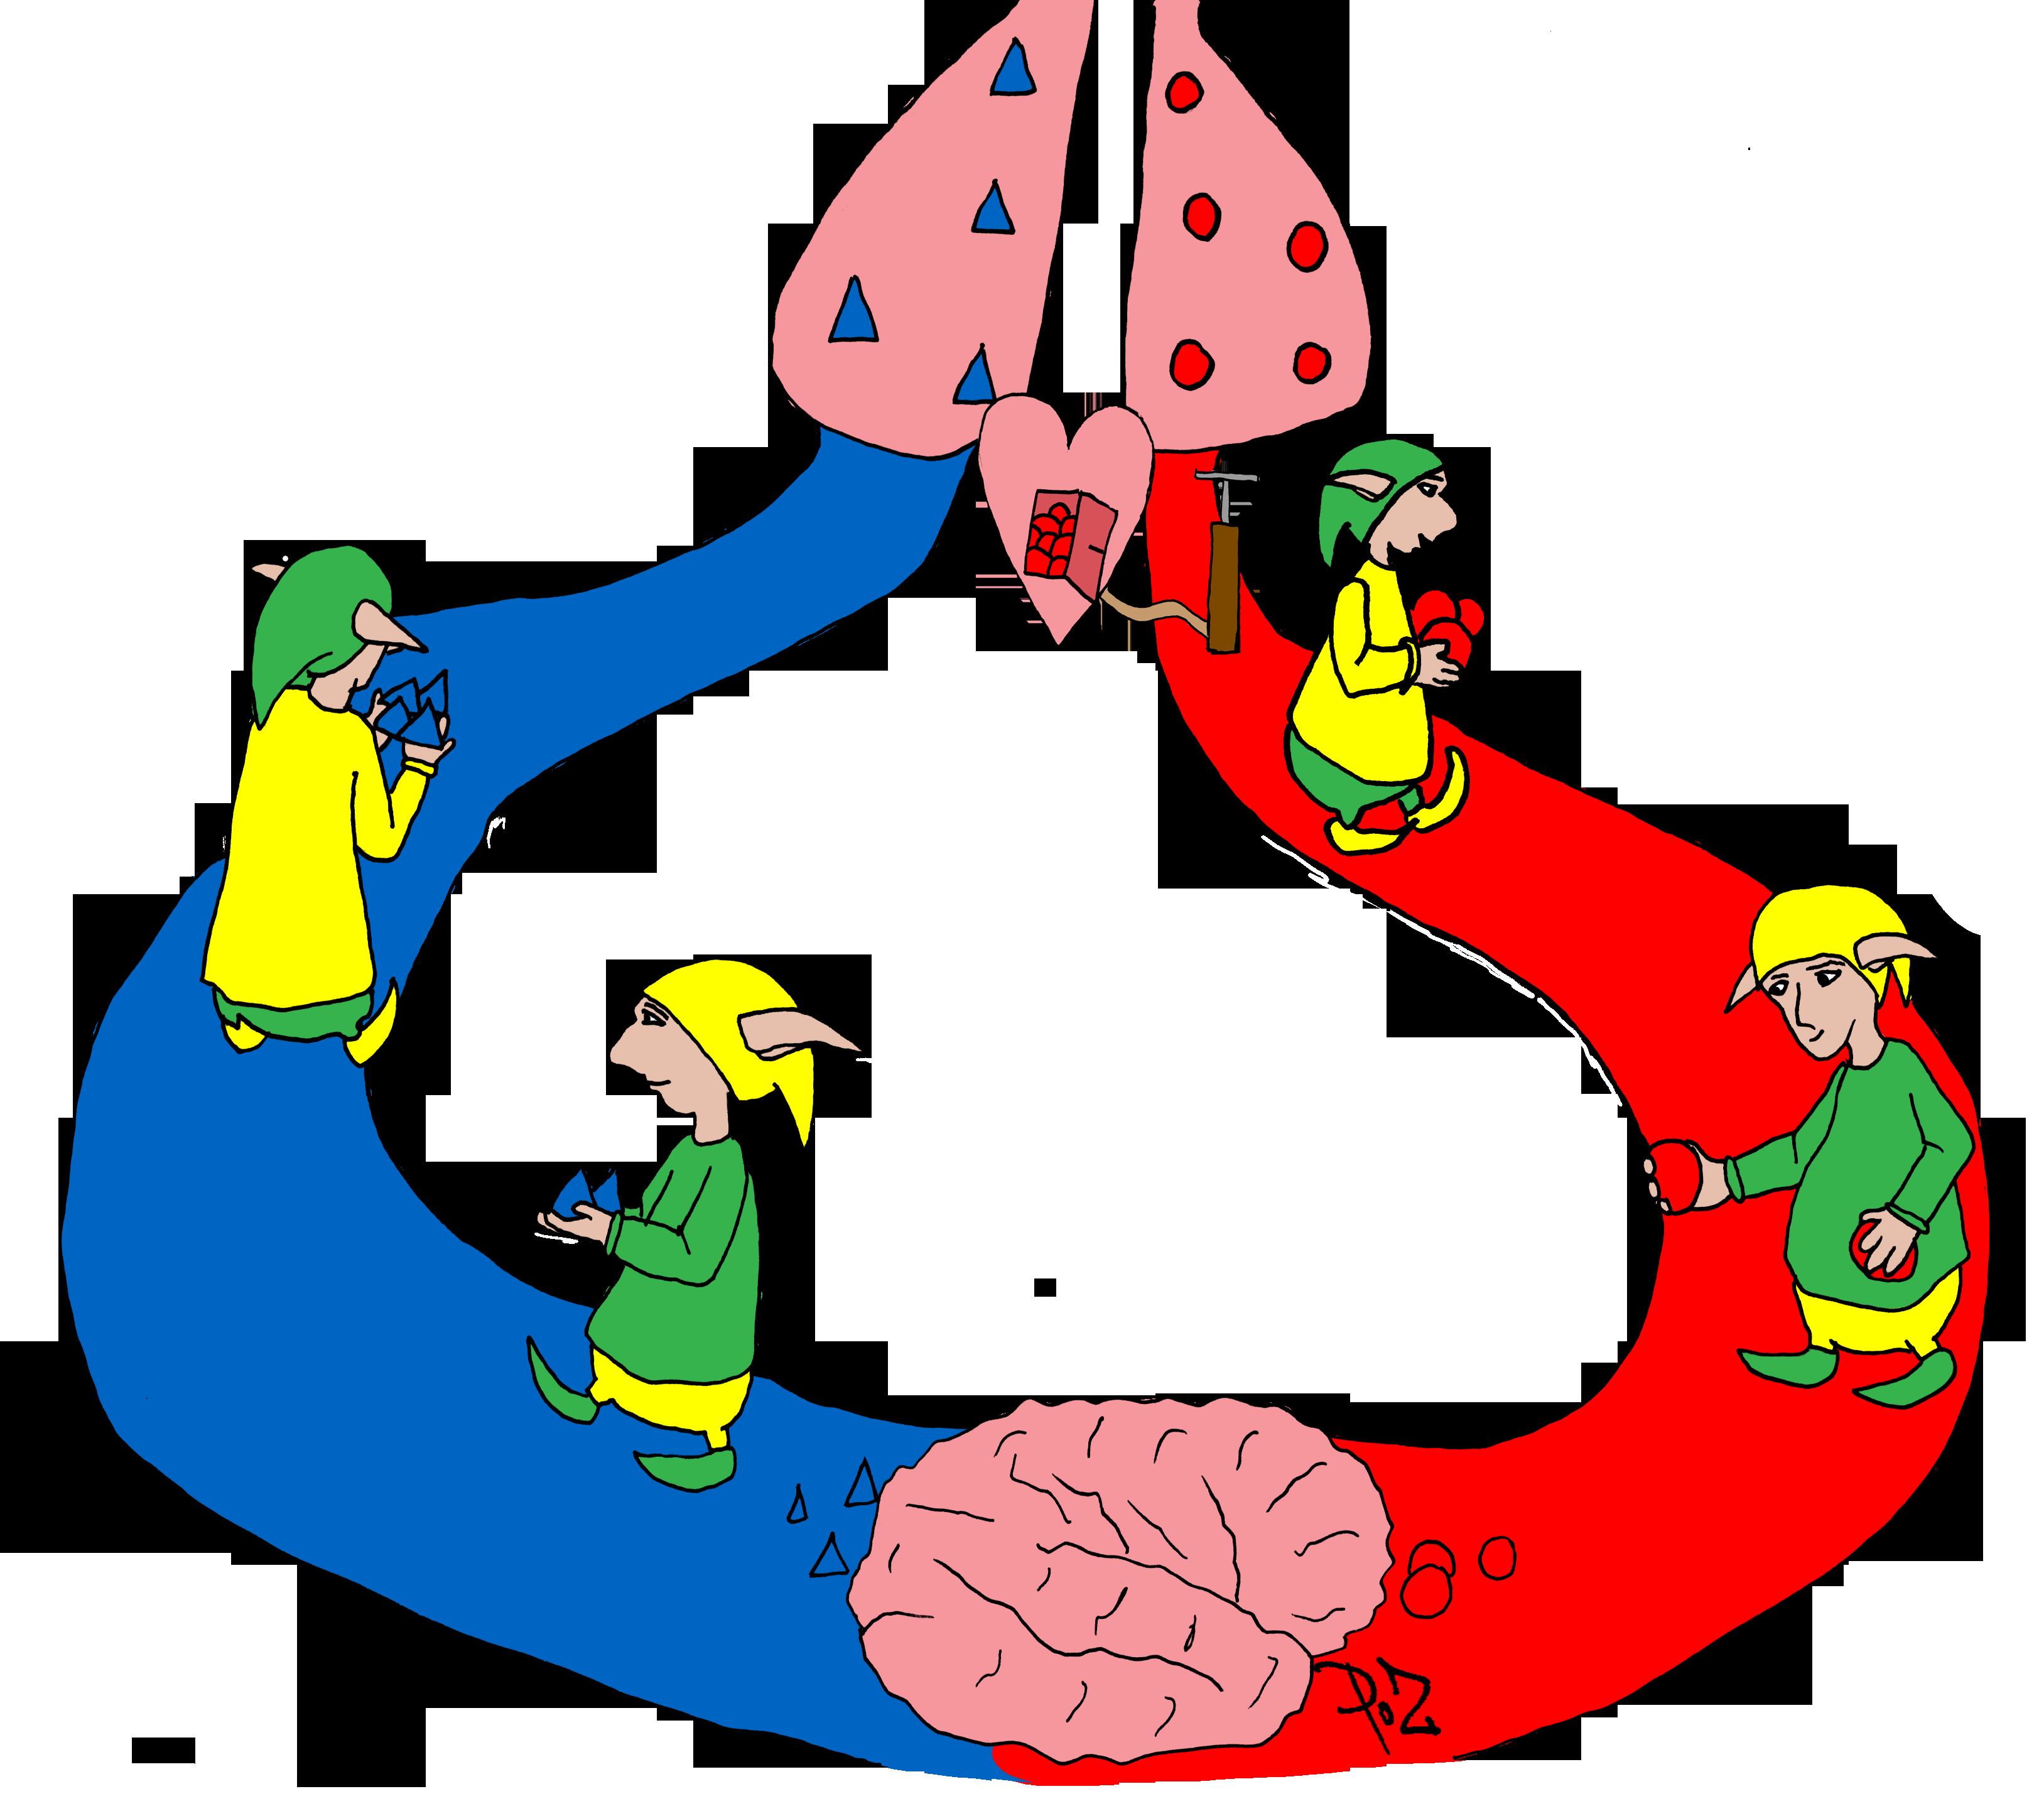 La circulation sanguine ~ La Classe des gnomes